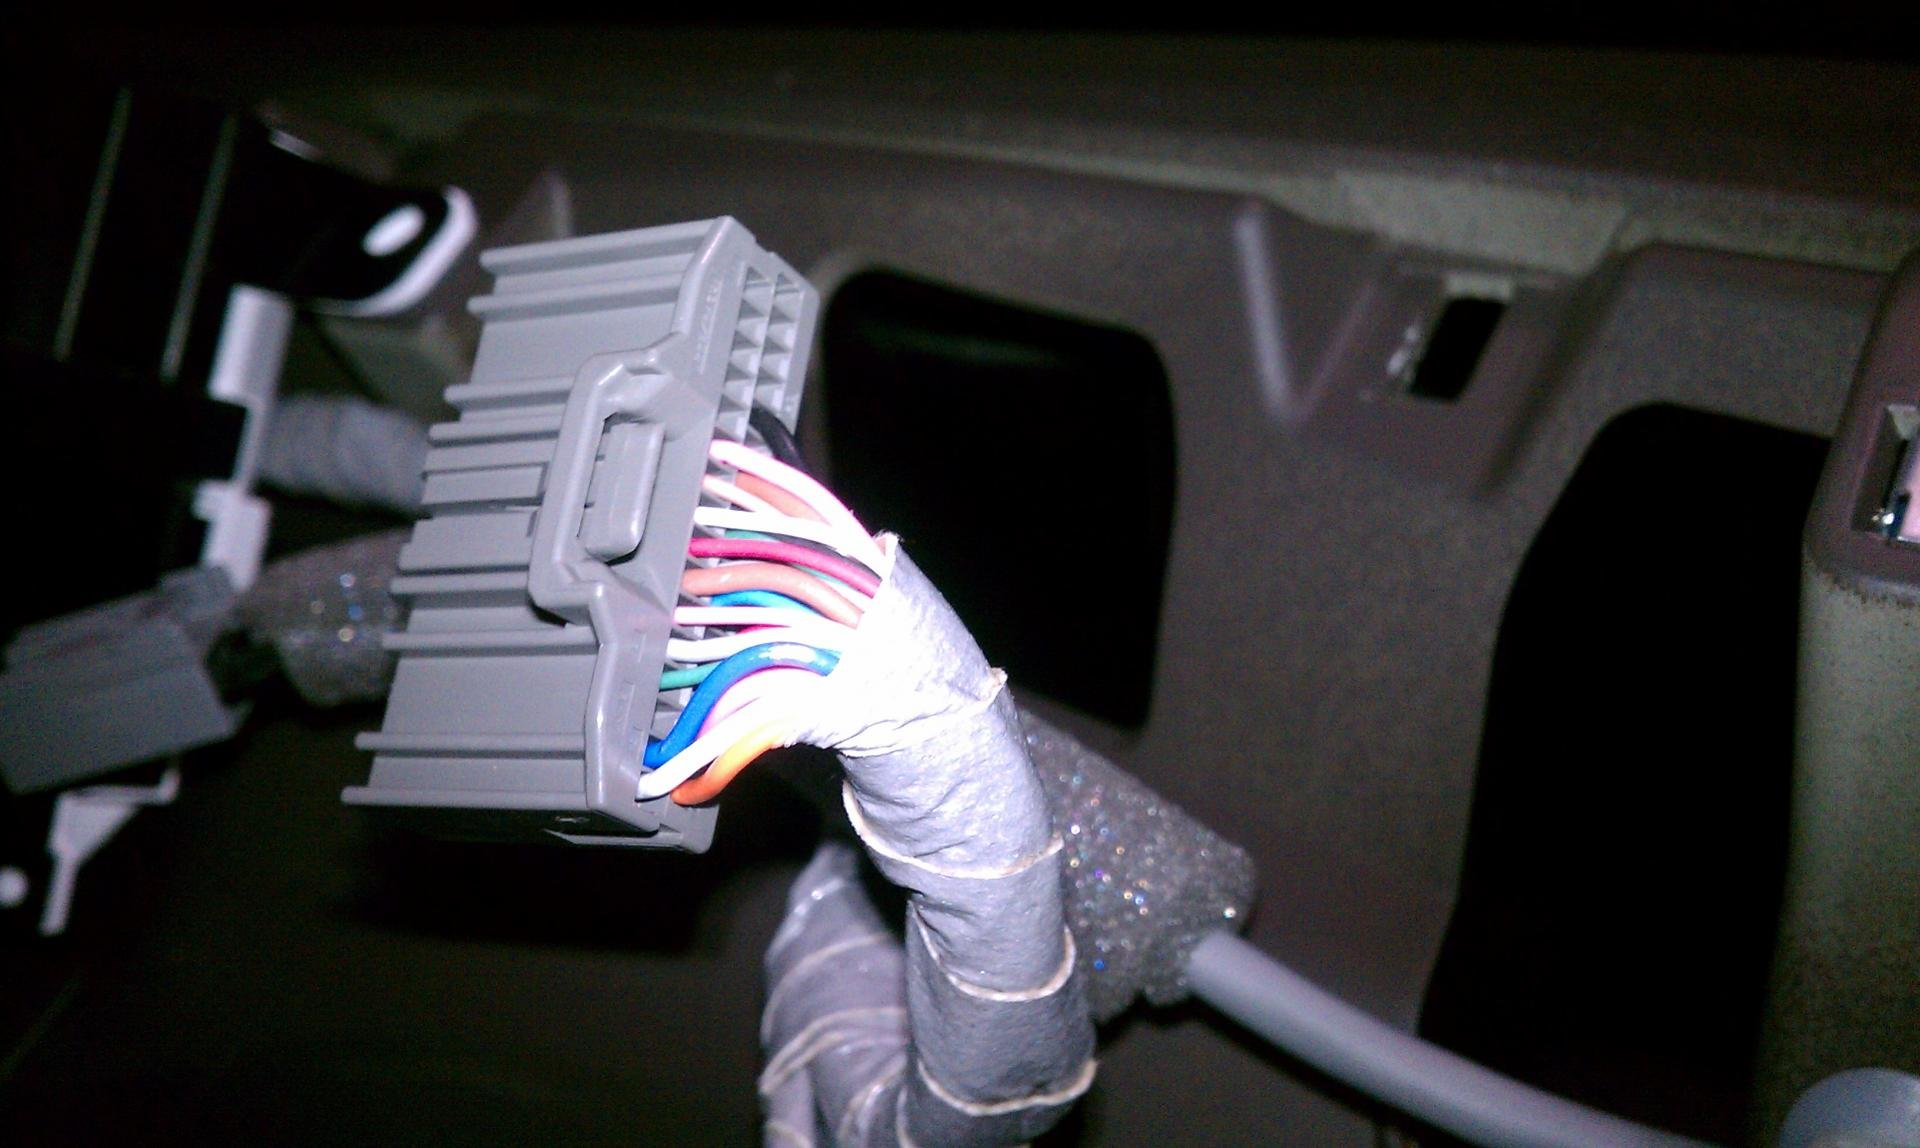 2012 civic wiring diagram reverse backup camera page 4 9th gen civic forum 2012 honda civic radio wiring diagram reverse backup camera page 4 9th